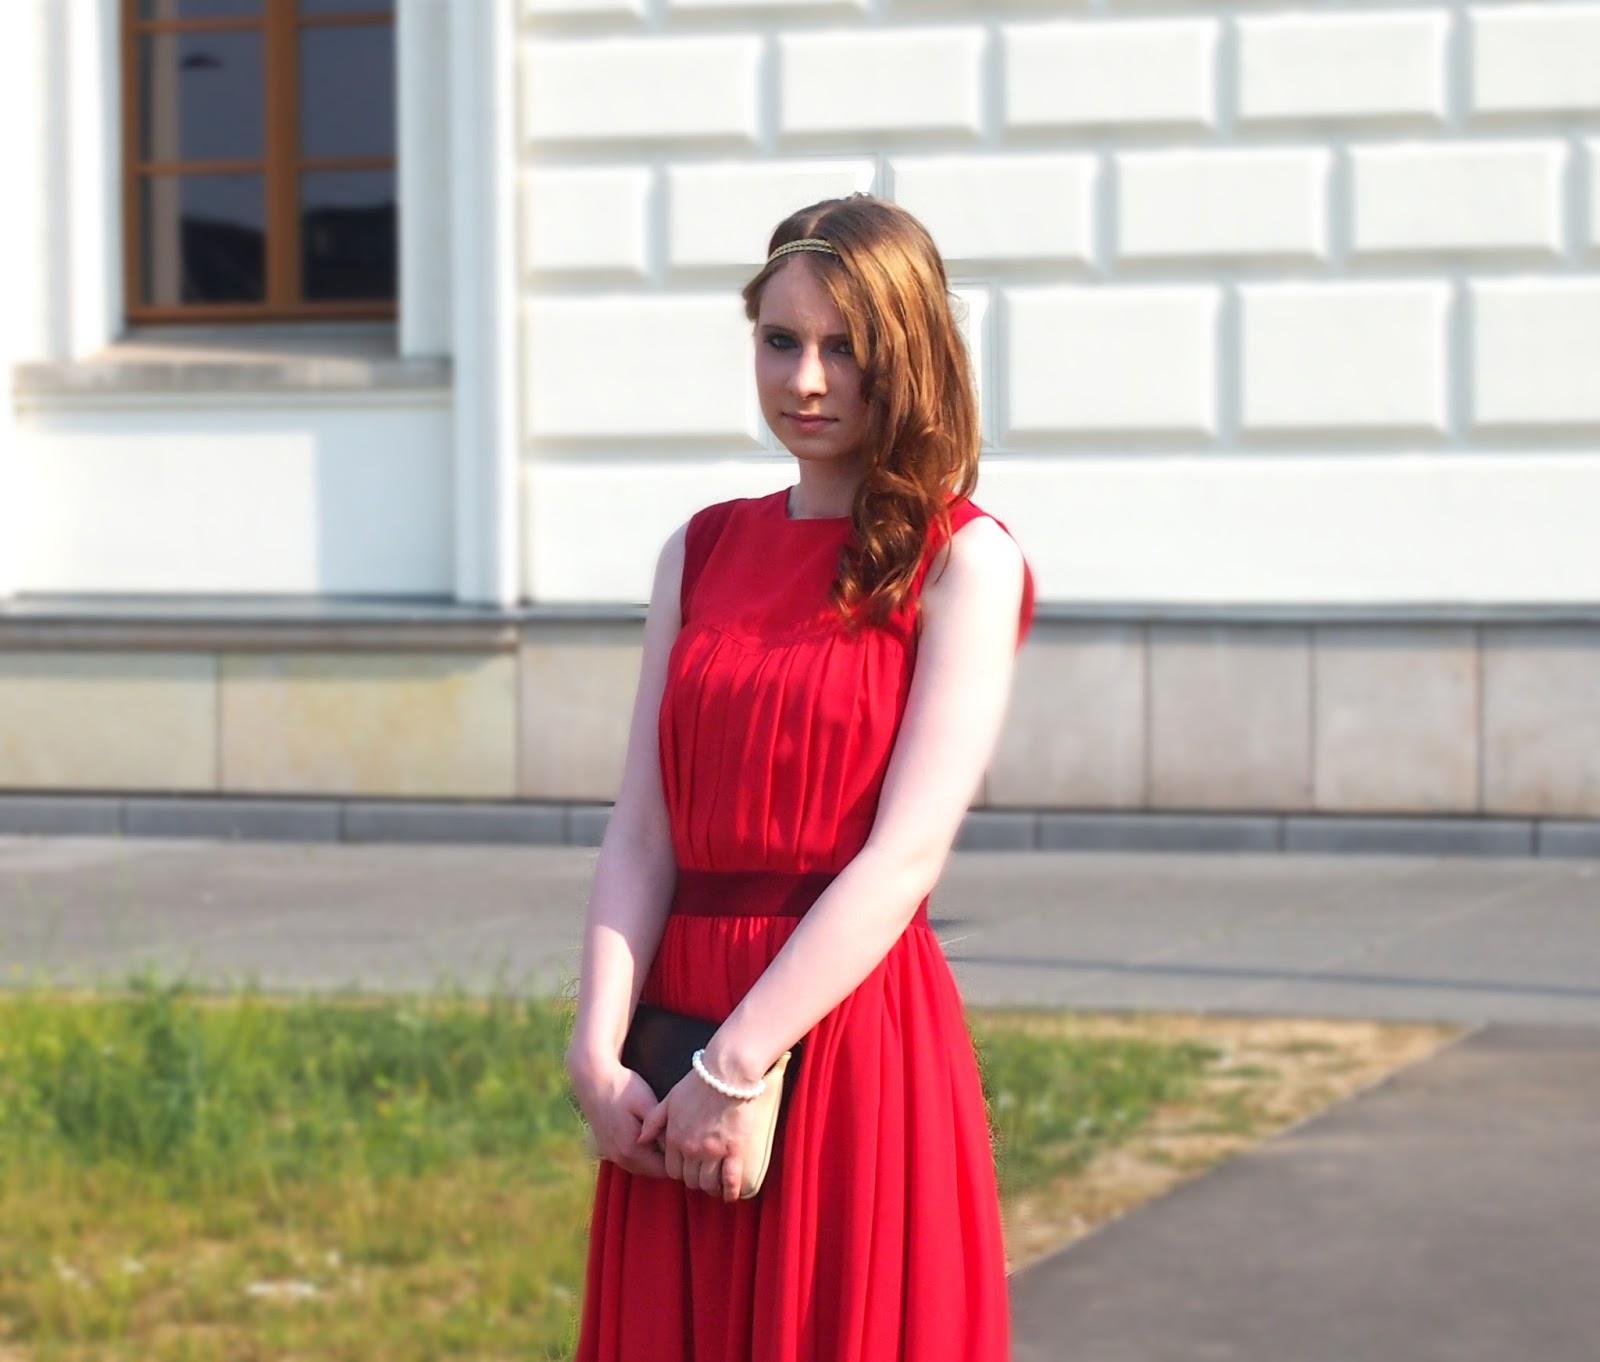 outfit: graduation ball dress - mein abiballkleid | the